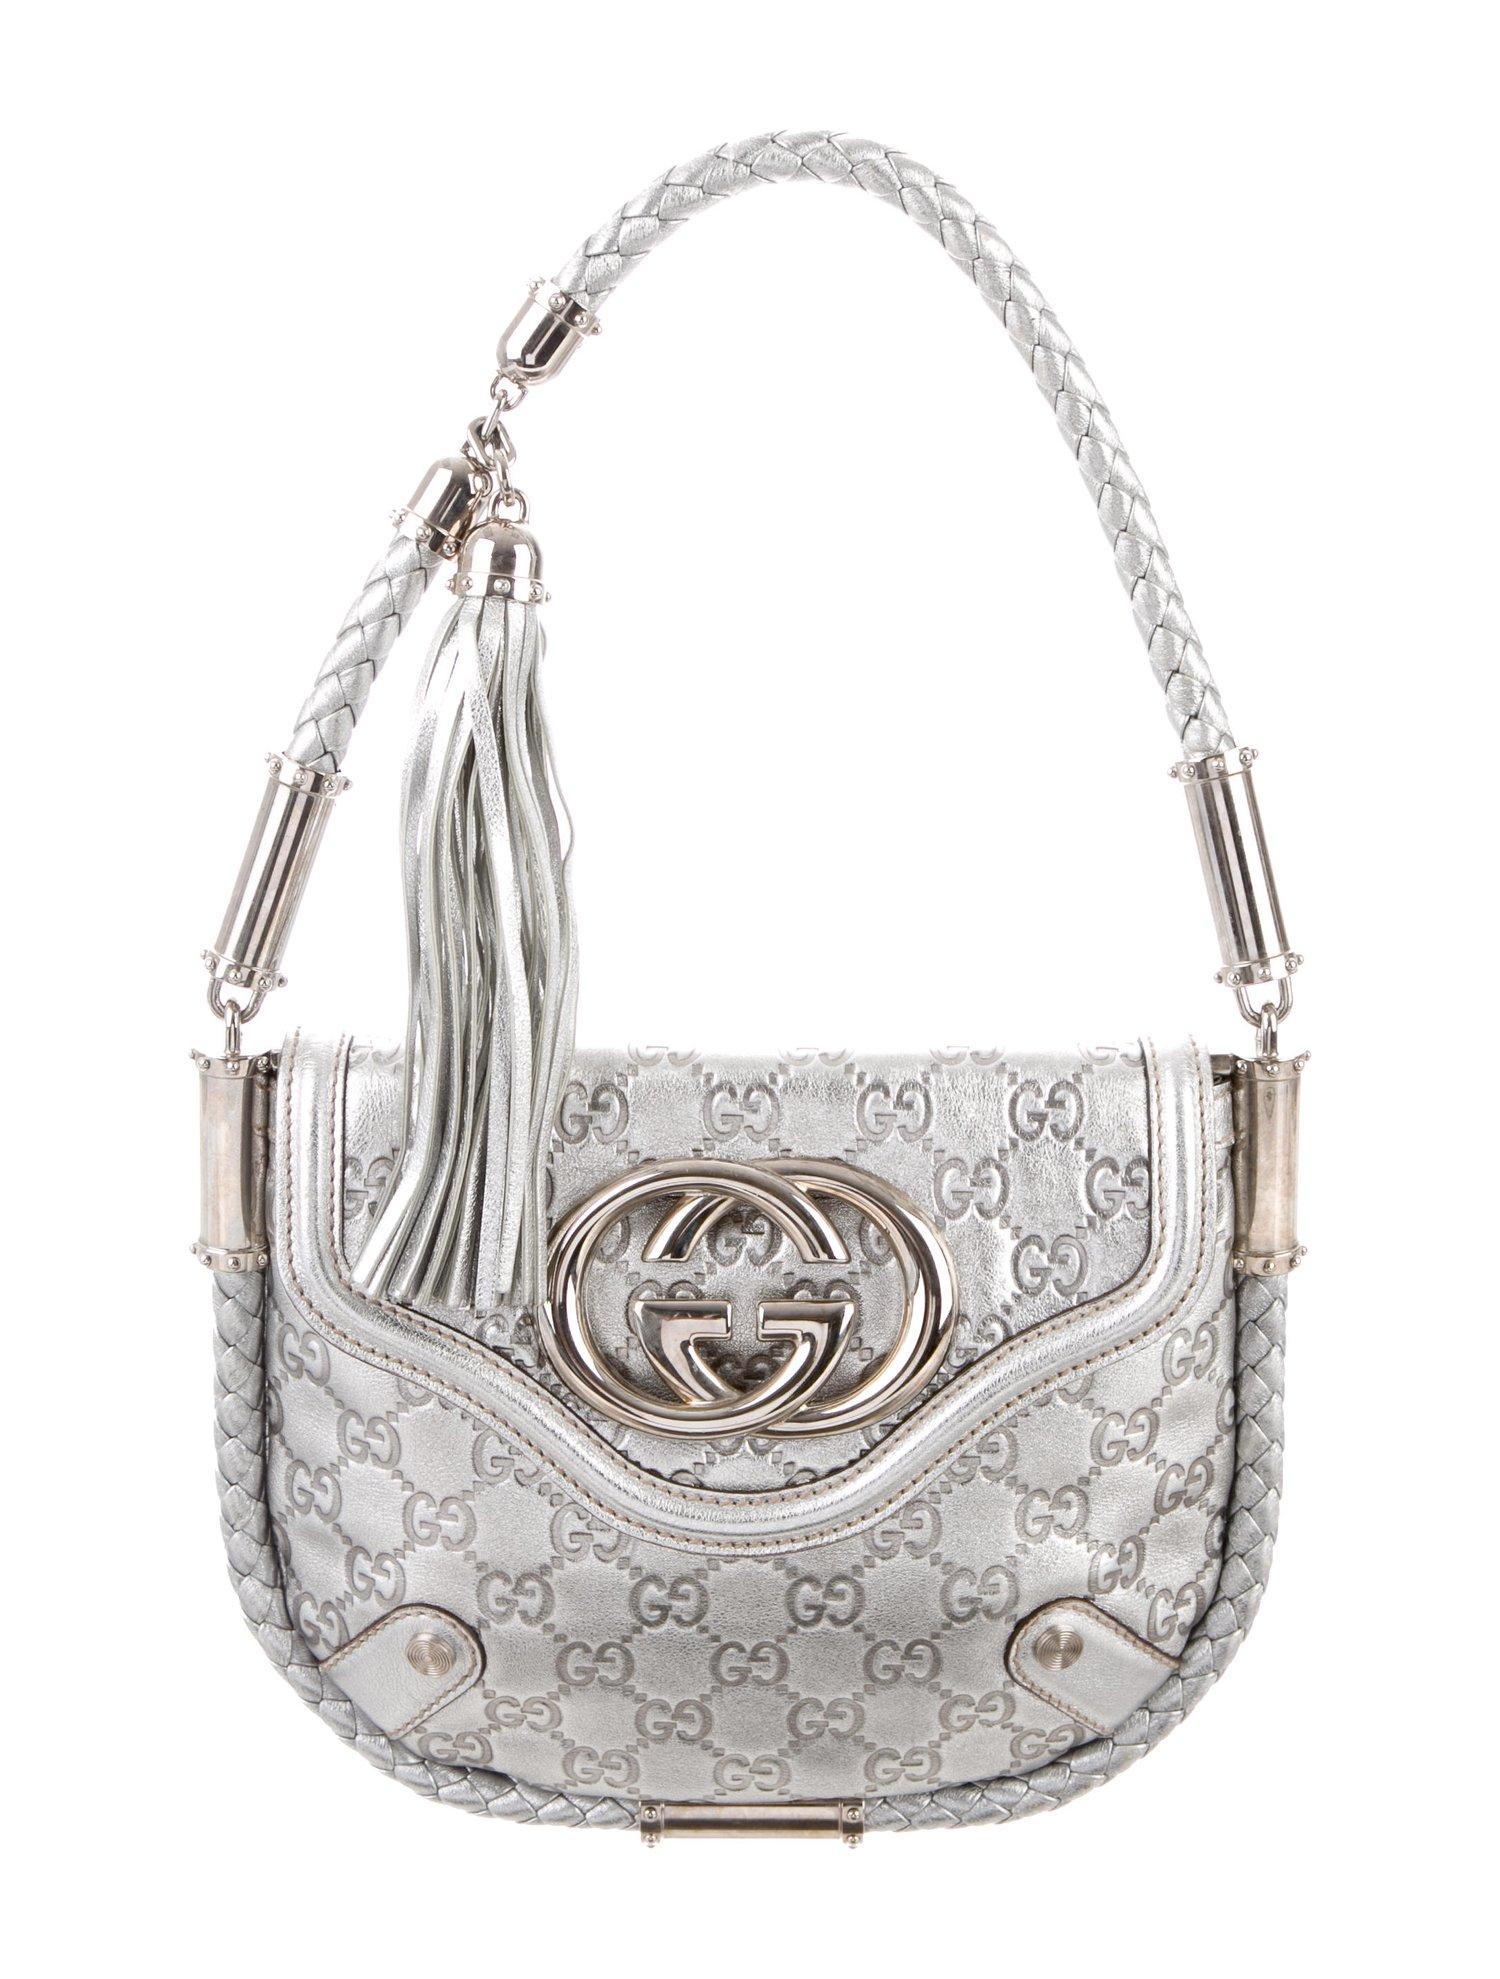 05834c7c295 Gucci Metallic Silver Guccissima Small Britt Shoulder Bag